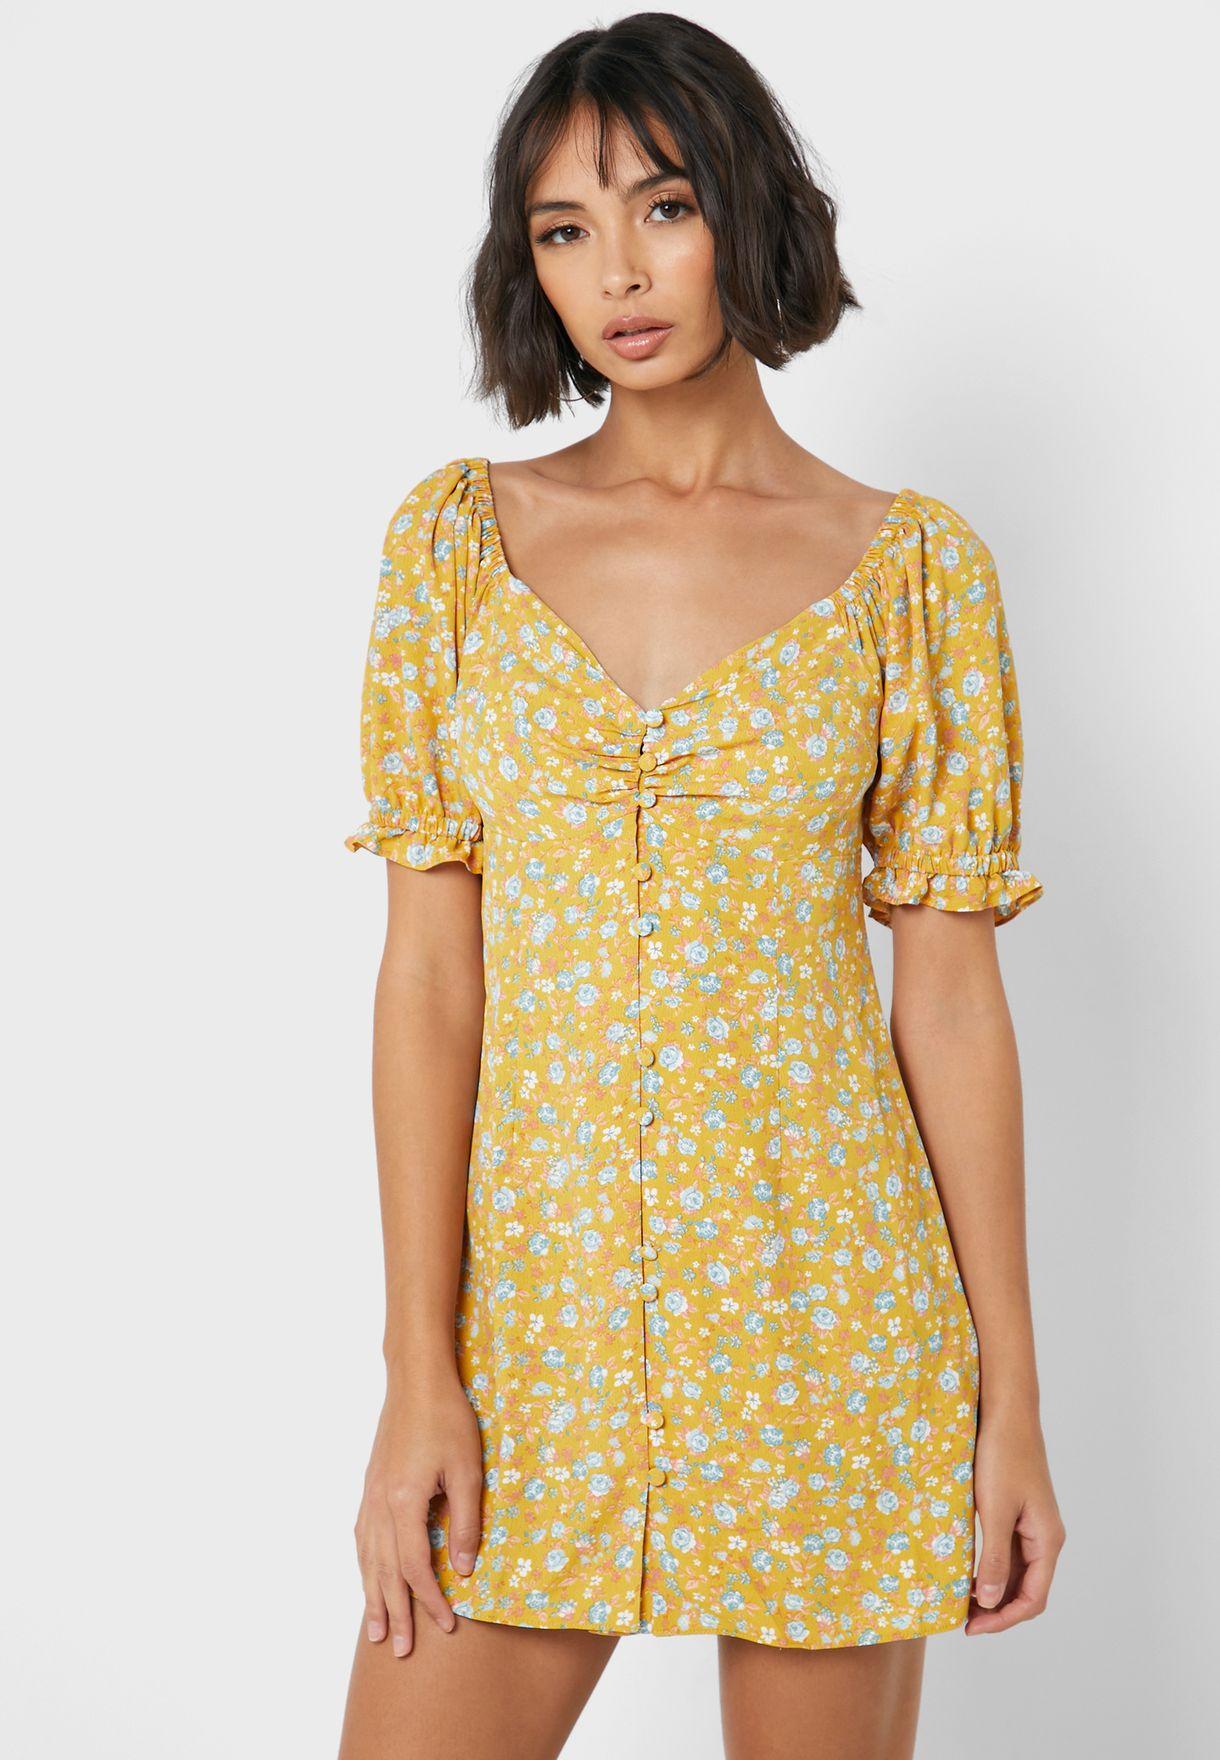 Ruffle Detail Button Down Printed Dress